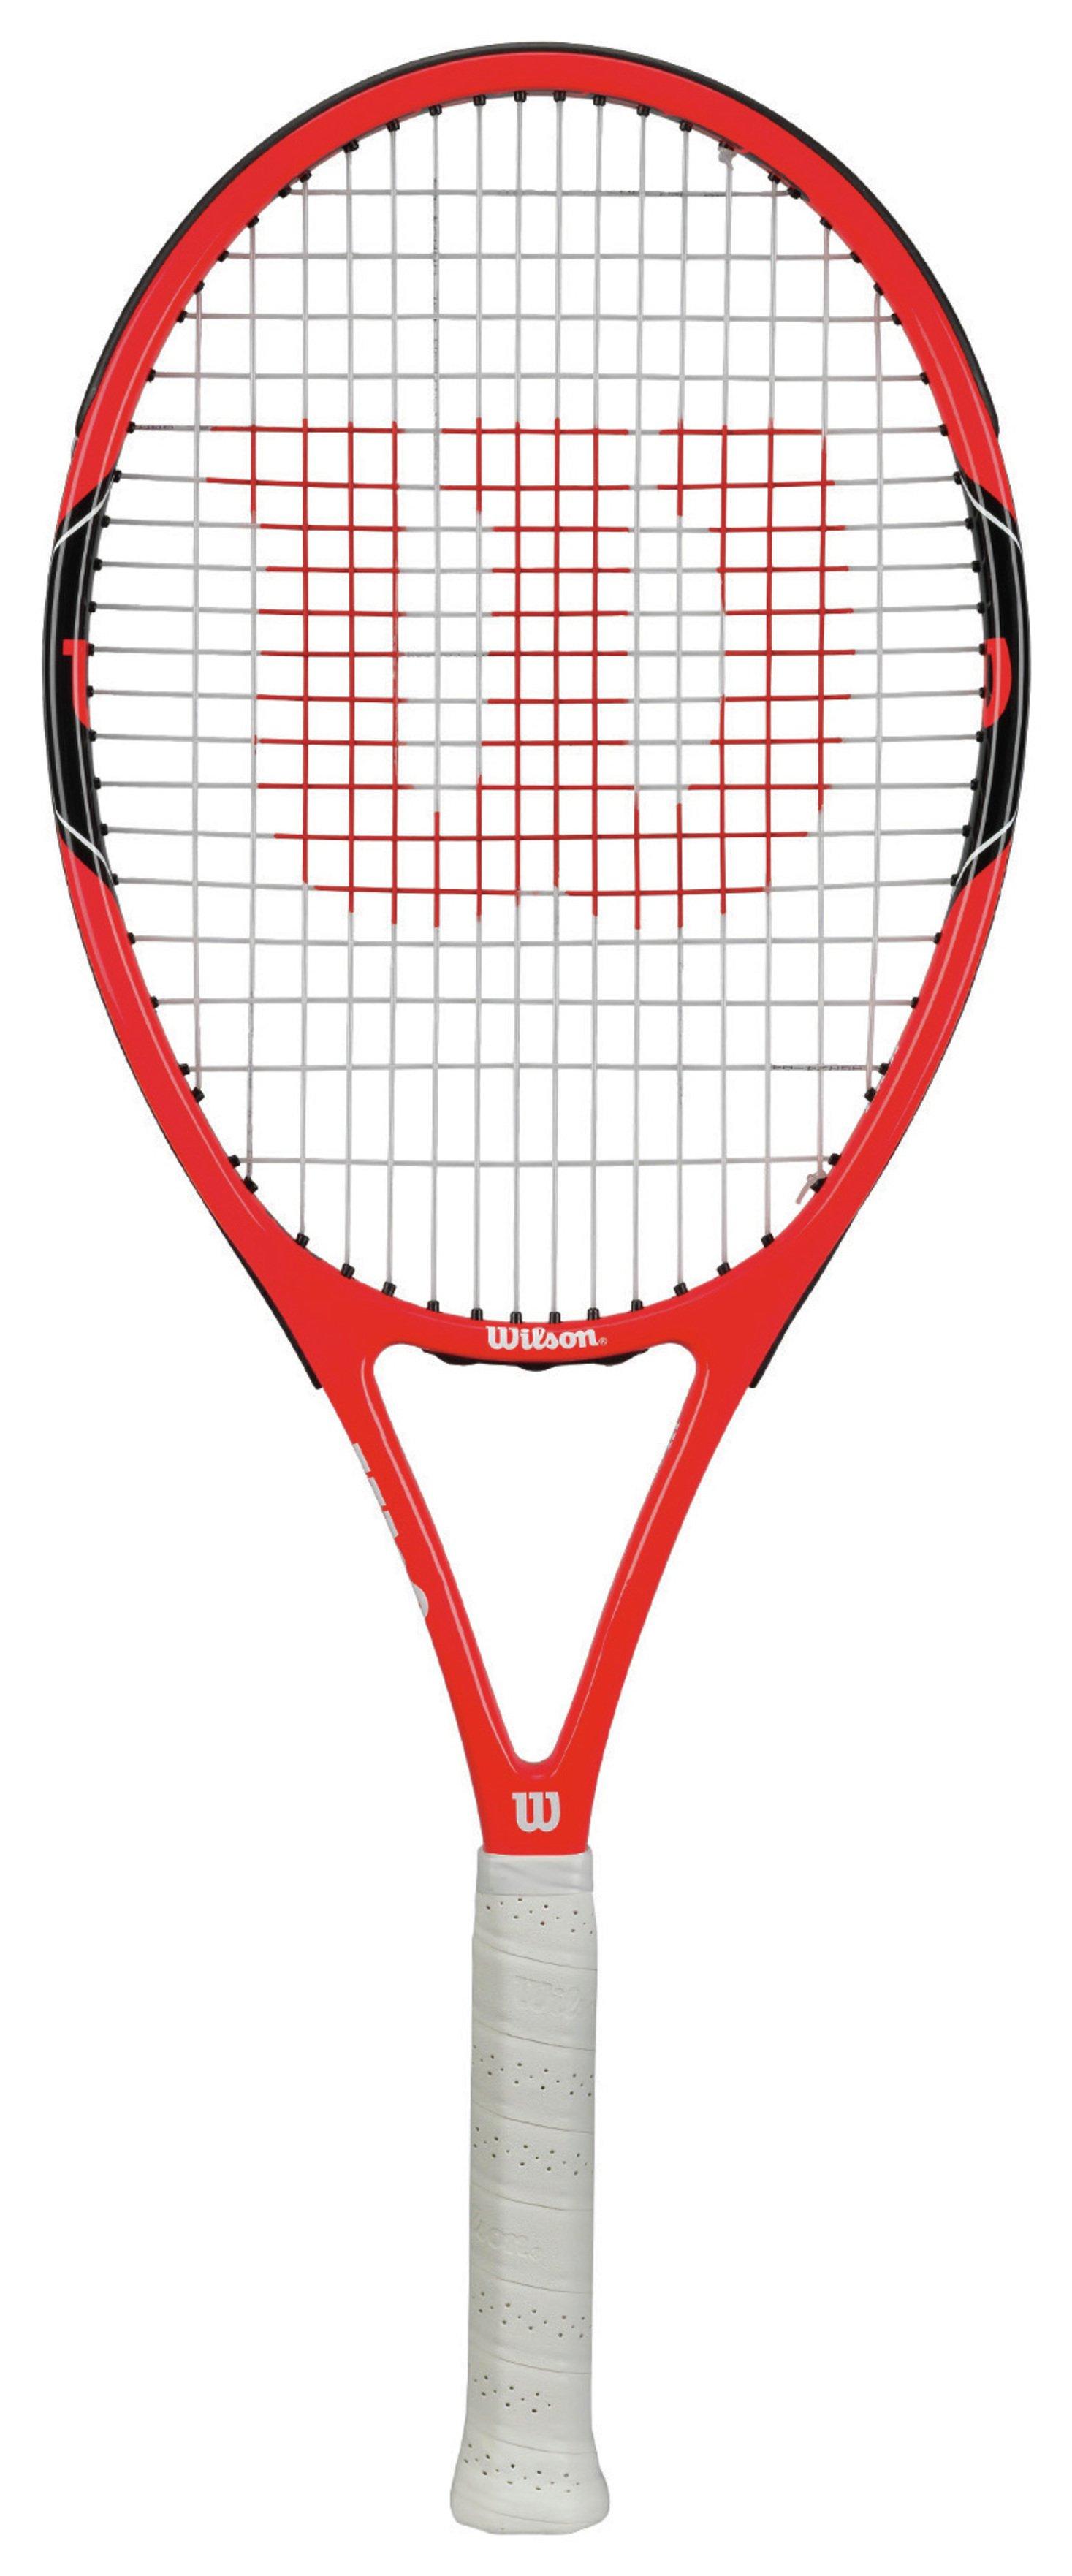 Wilson Roger Federer 100 Adult Tennis Racket - 27 Inch